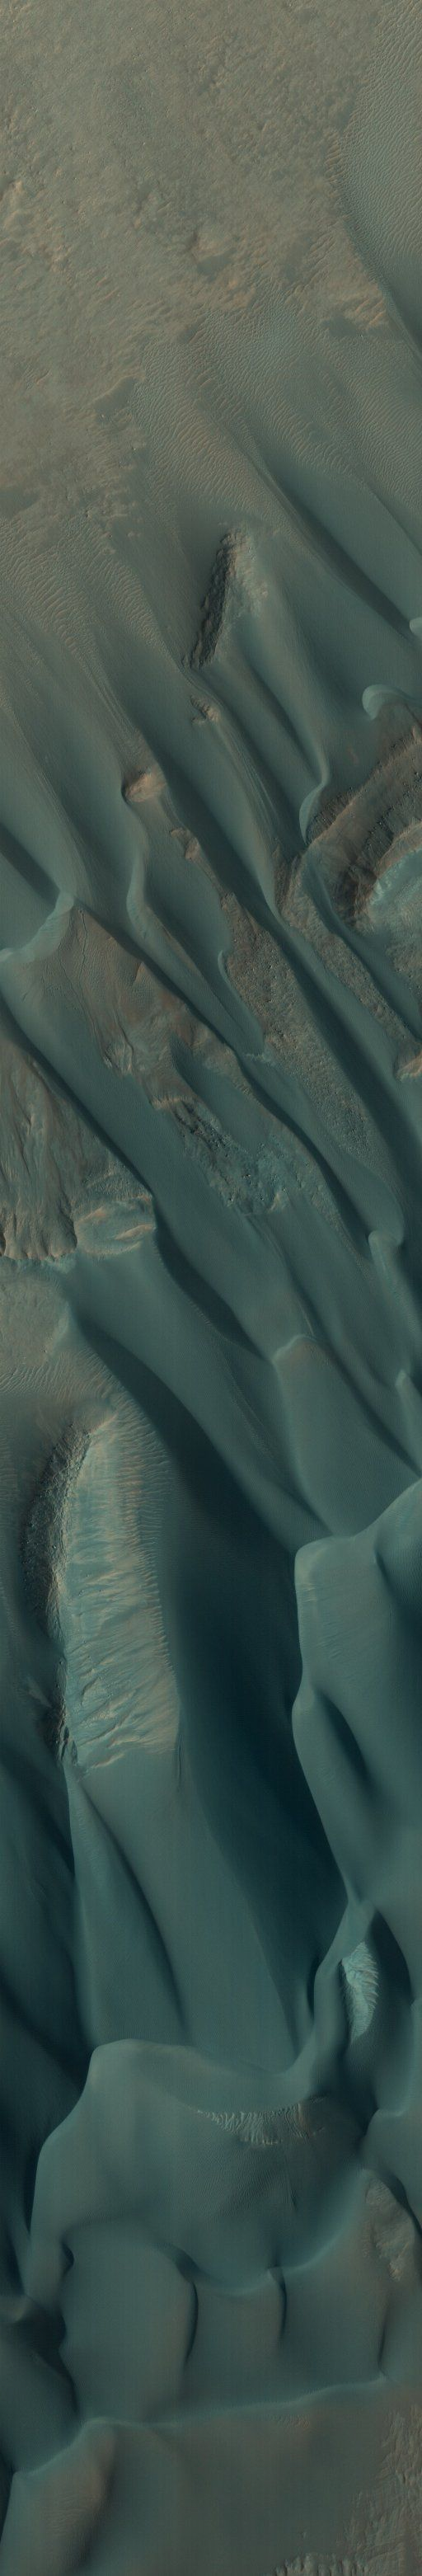 MARS Dunes in the Western Nereidum Montes. Credit: NASA/JPL/University of Arizona